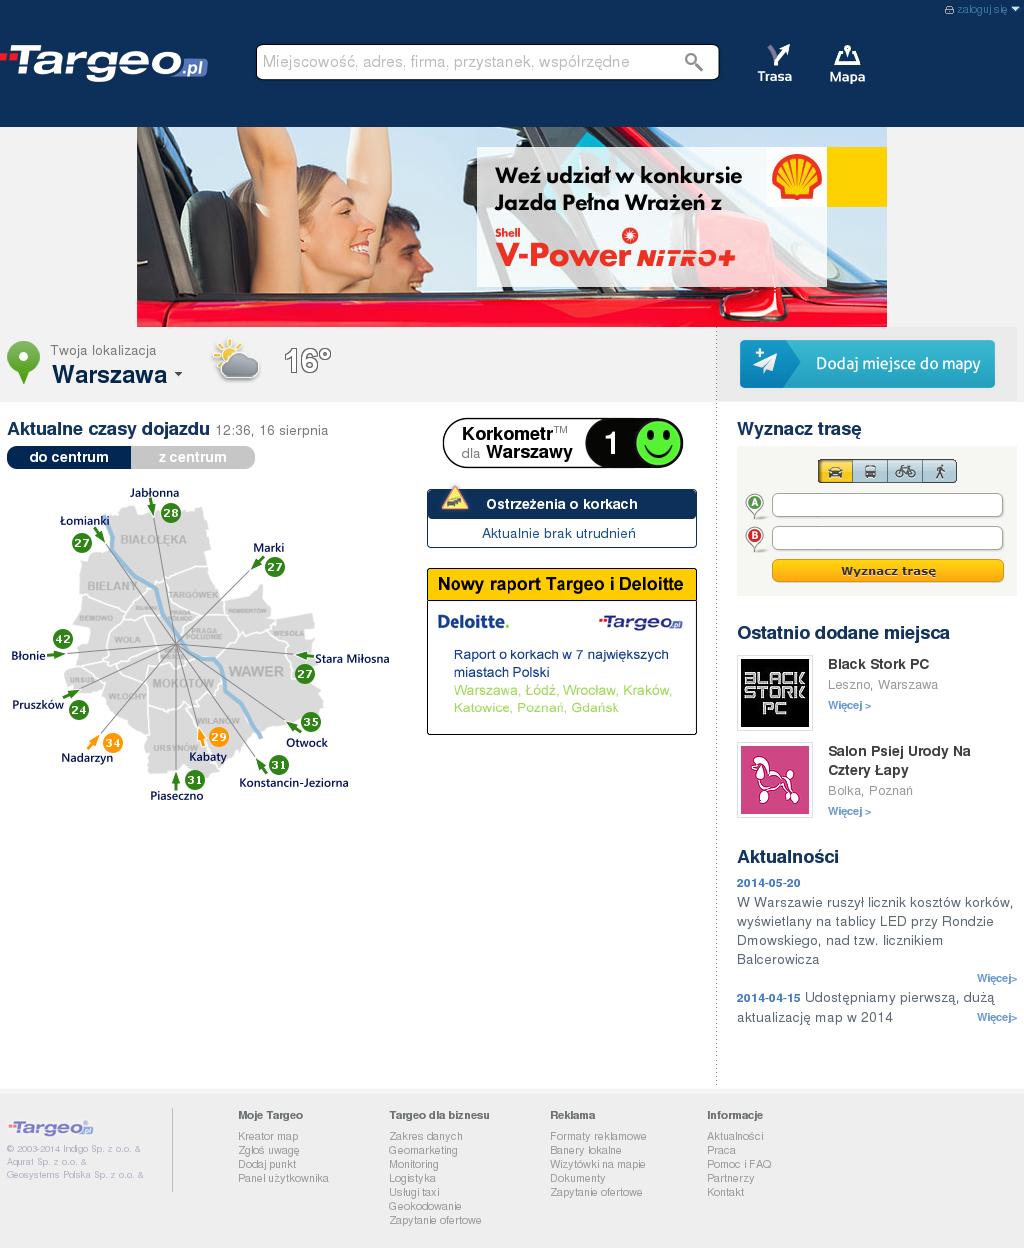 Polska do tablicy online dating